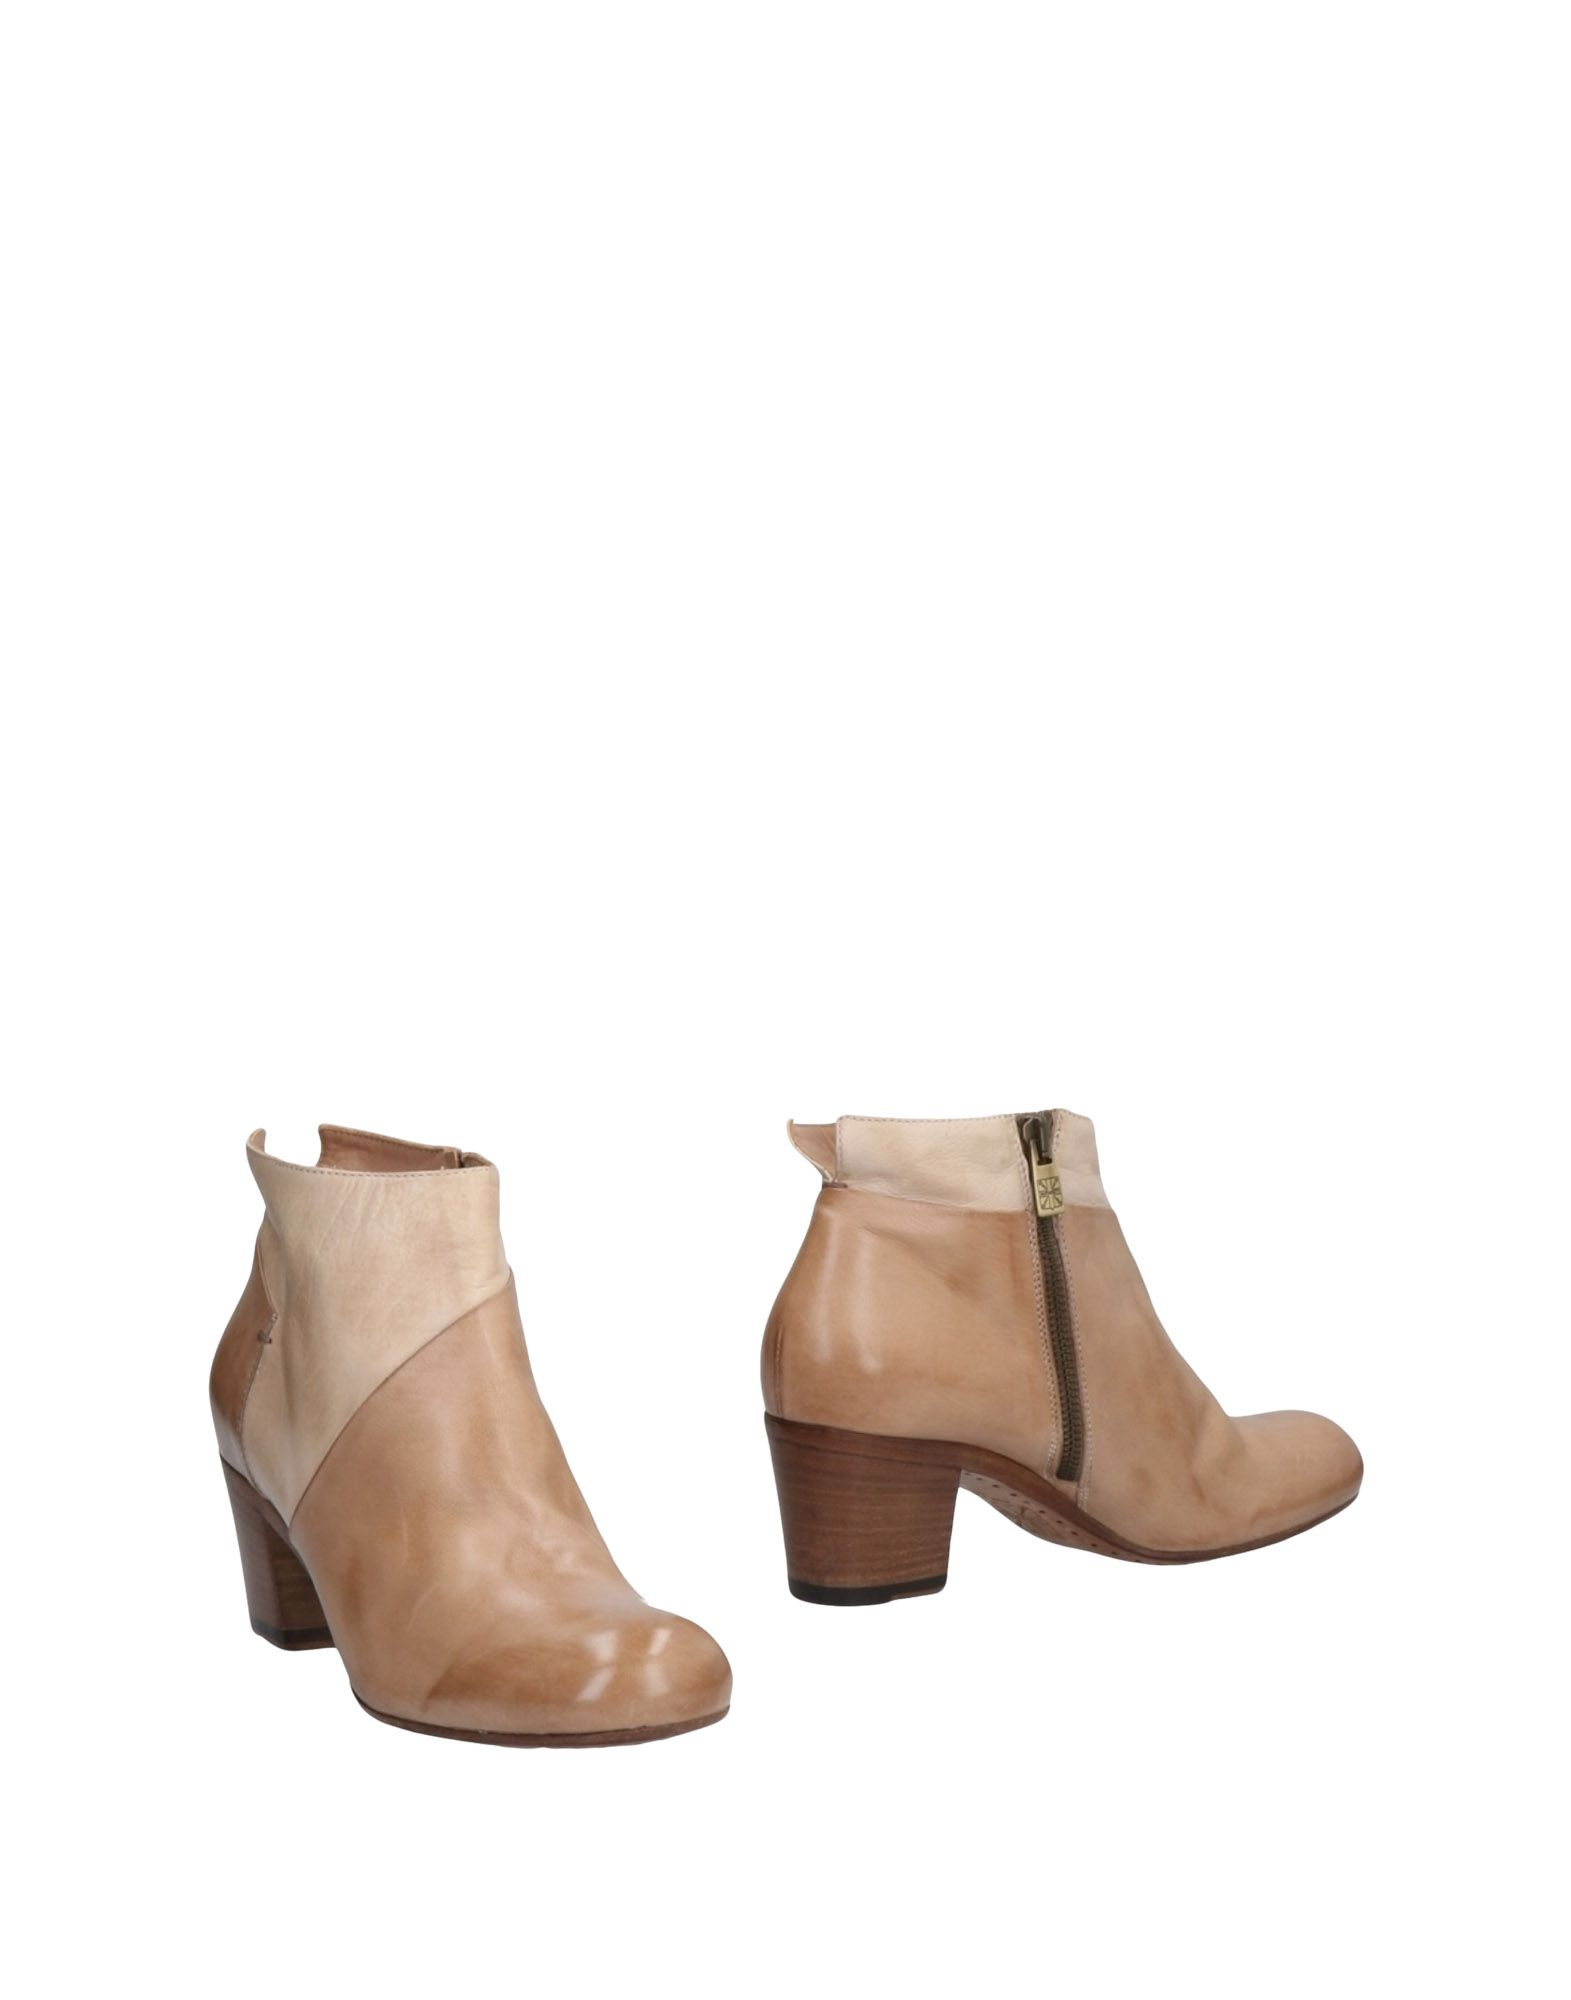 Pantanetti Stiefelette strapazierfähige Damen  11468082WQGut aussehende strapazierfähige Stiefelette Schuhe d94896